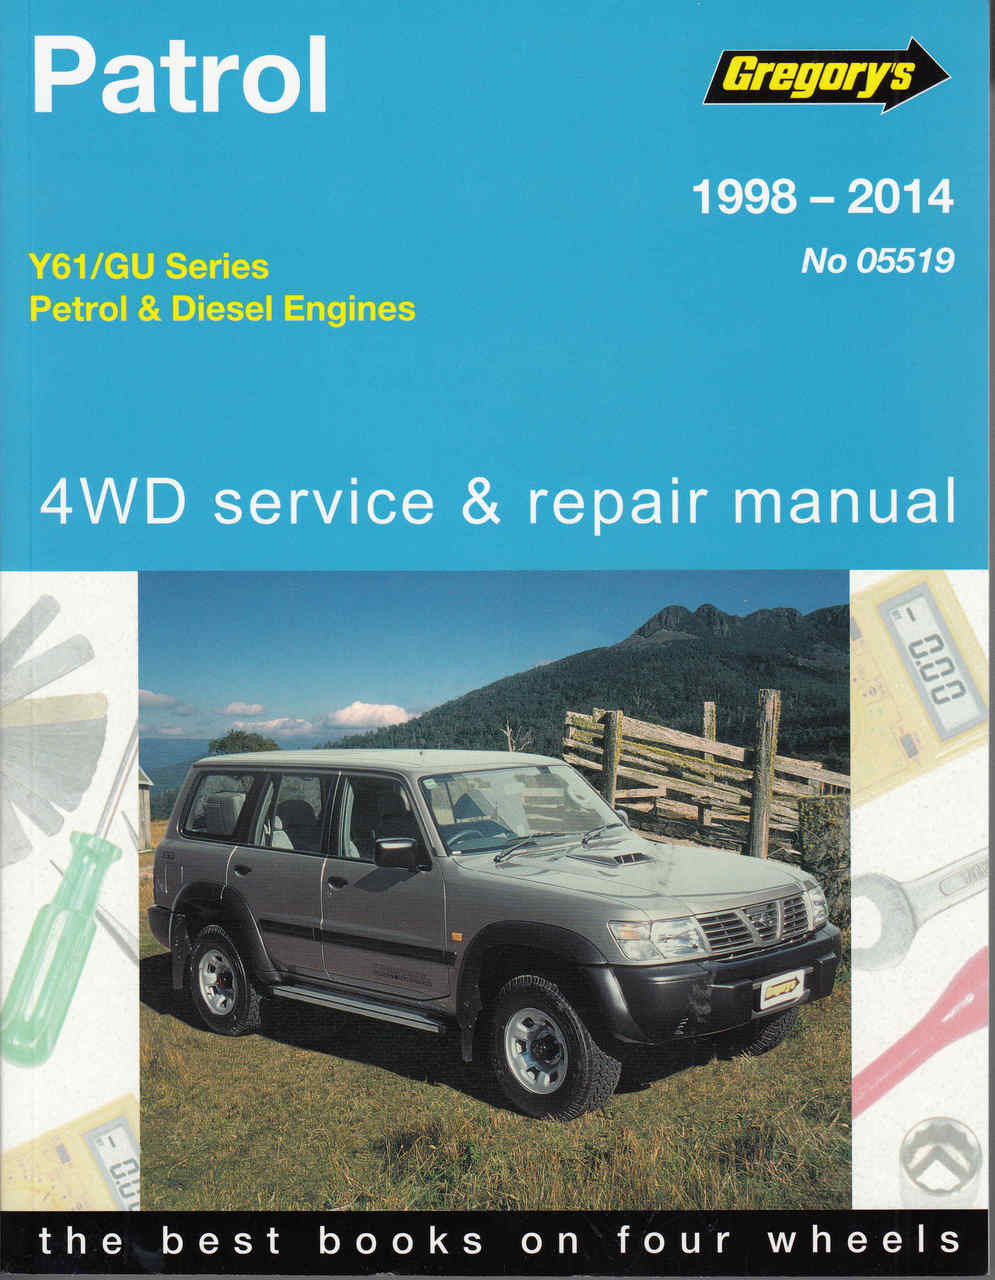 nissan patrol y61 guseries petrol diesel 1998 2014 workshop manua rh automotobookshop com au electronic service manual nissan patrol y61 pdf nissan patrol y61 repair manual